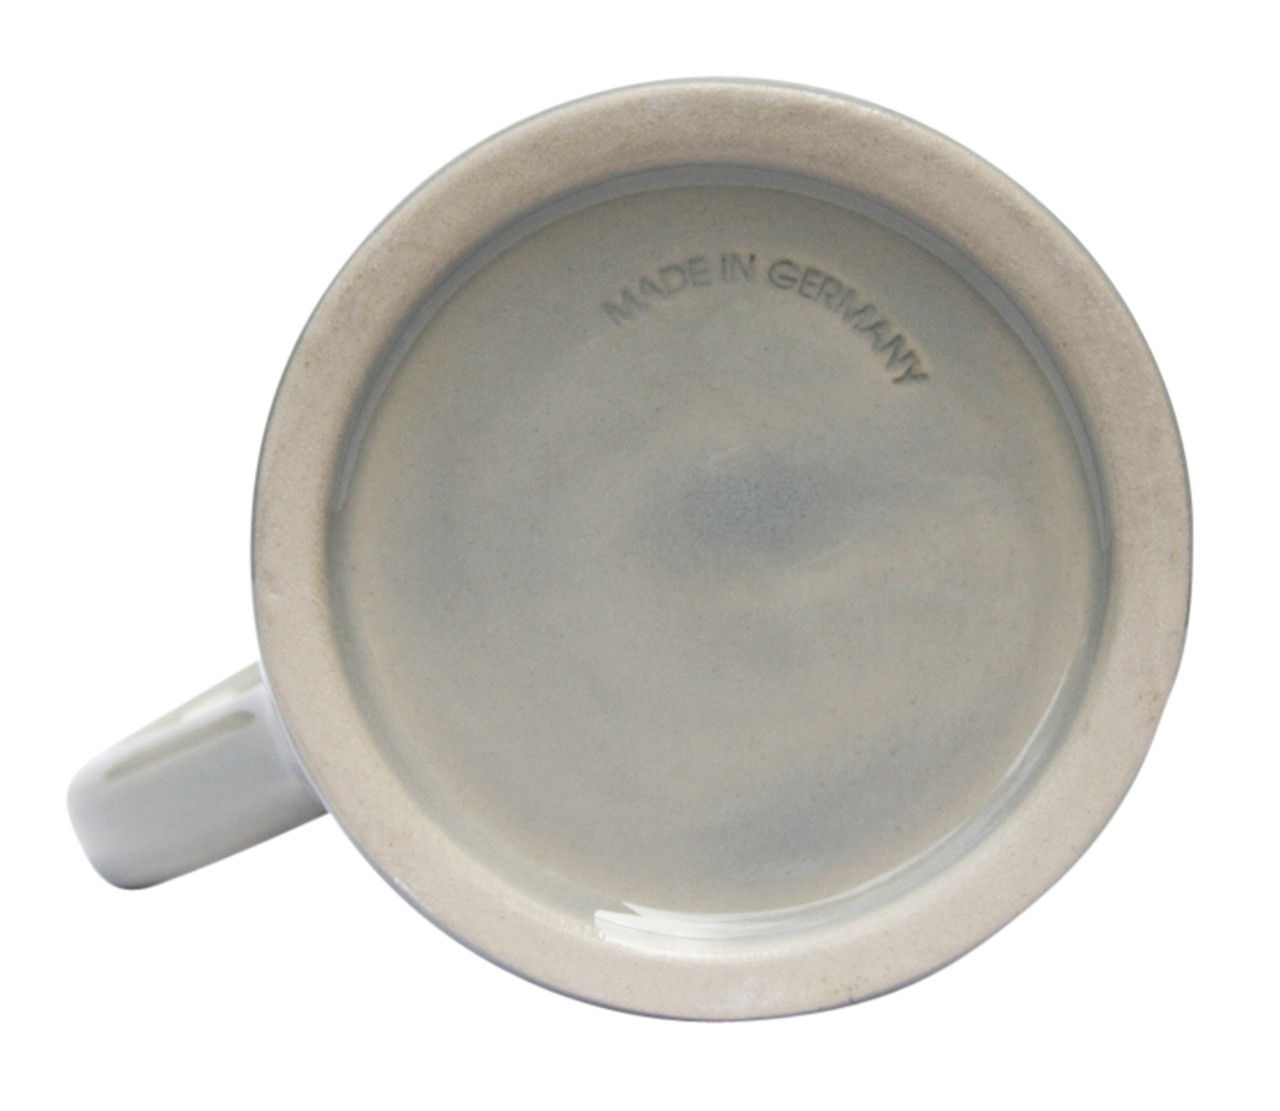 Bottom of 1 Liter Ceramic Beer Mug